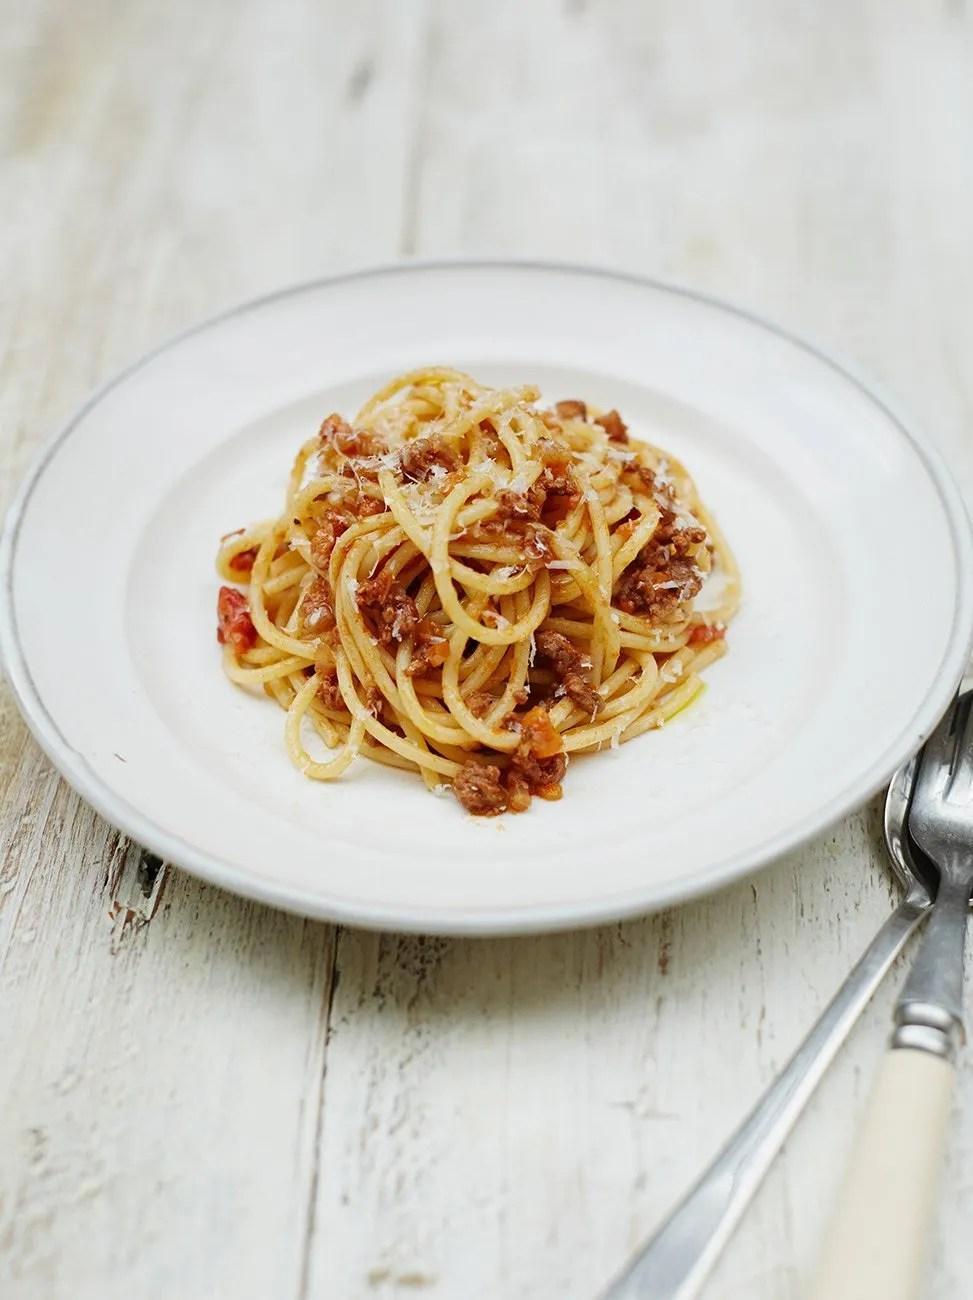 Resep Spaghetti Bolognaise : resep, spaghetti, bolognaise, Deliciously, Spaghetti, Bolognese, Recipe, Jamie, Oliver